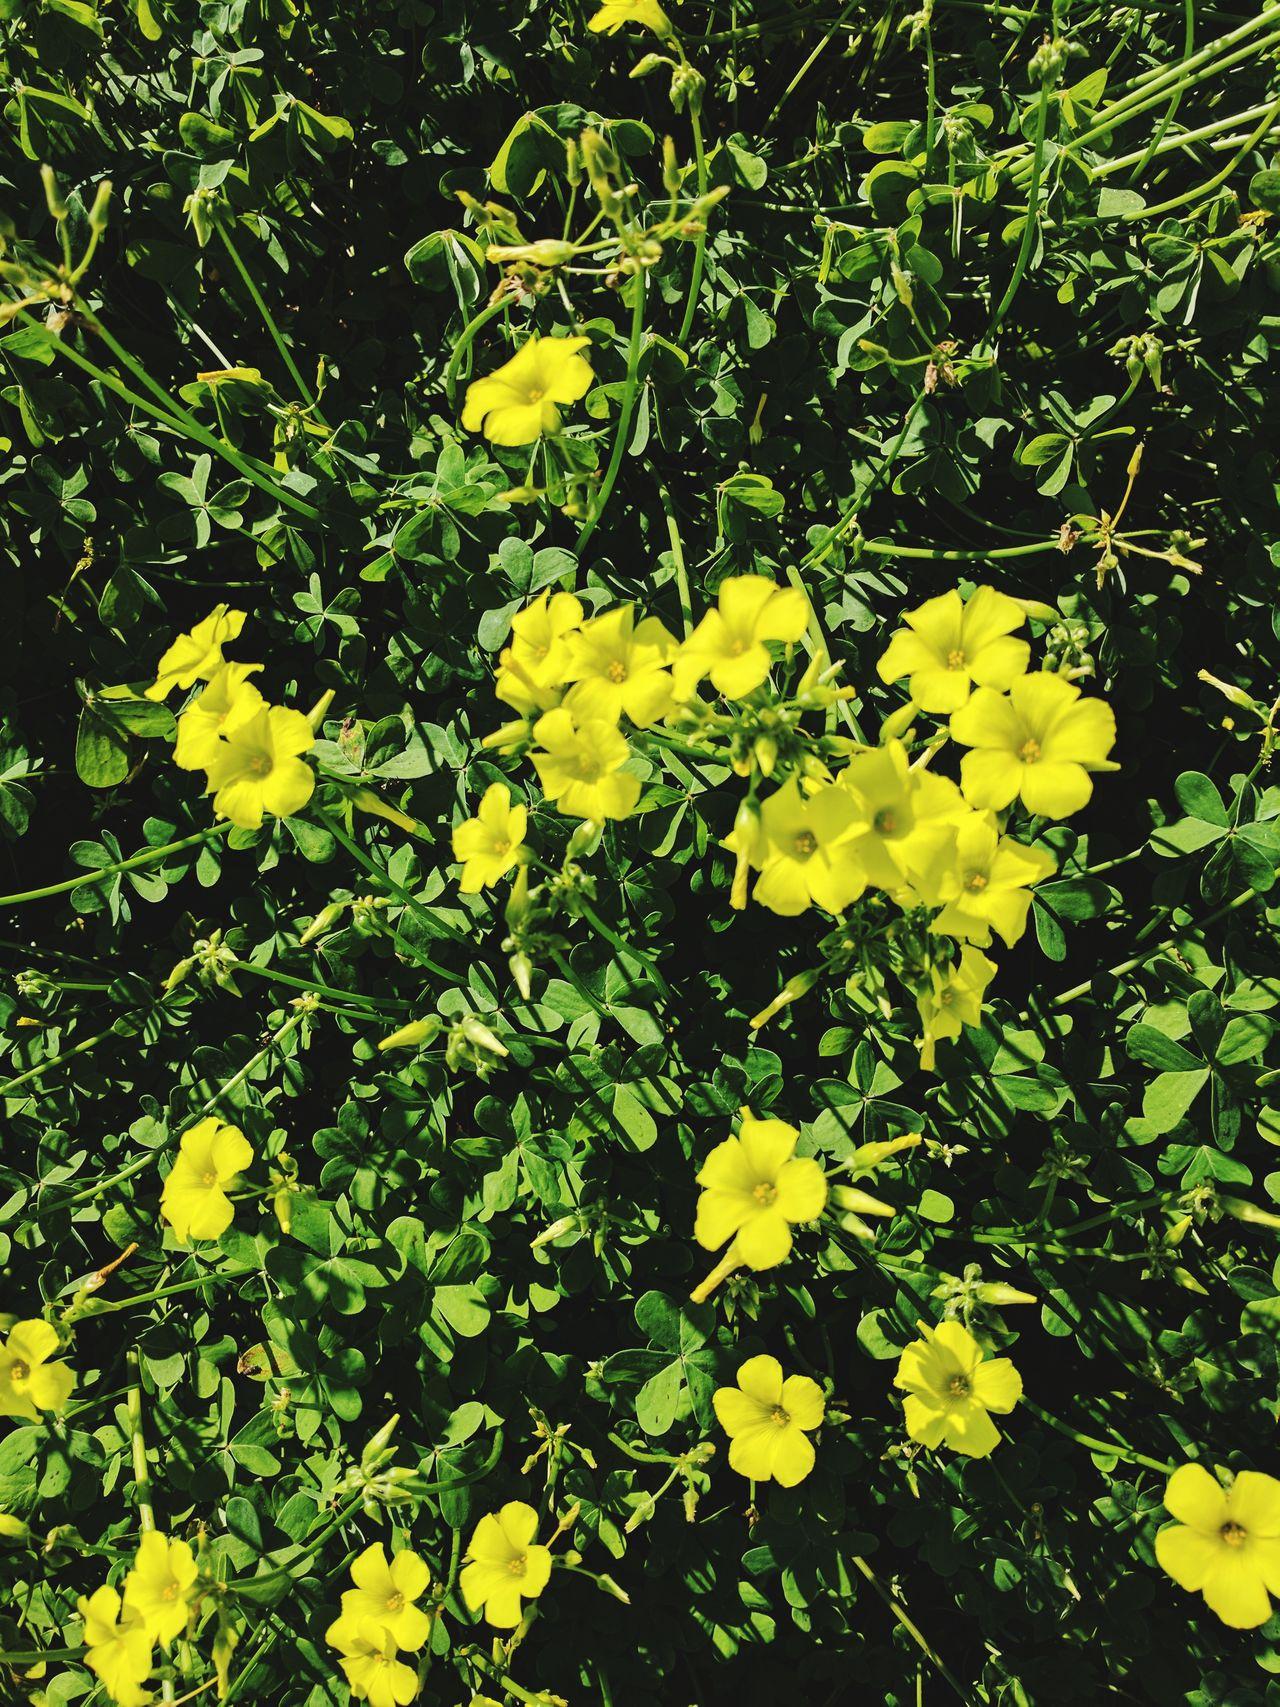 Botany EyeEmFlower EyeEm Nature Lover Botanical Flowerporn First Eyeem Photo Flower Head